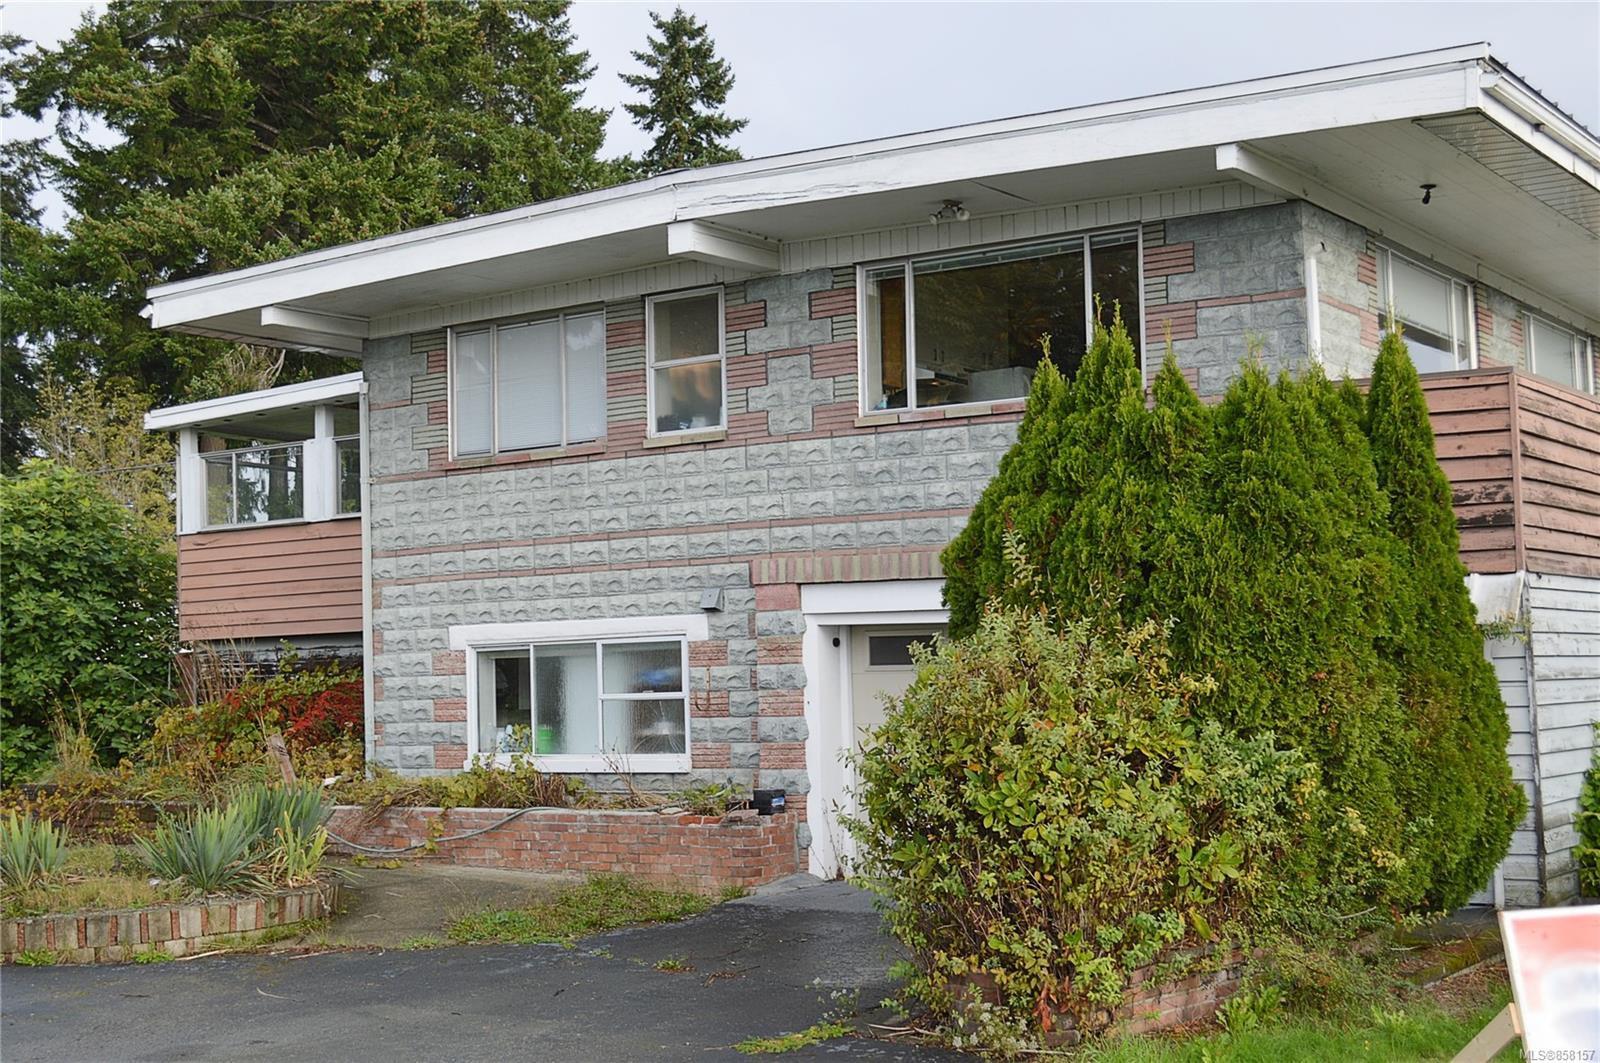 Main Photo: 5010 Cherry Creek Rd in : PA Port Alberni House for sale (Port Alberni)  : MLS®# 858157